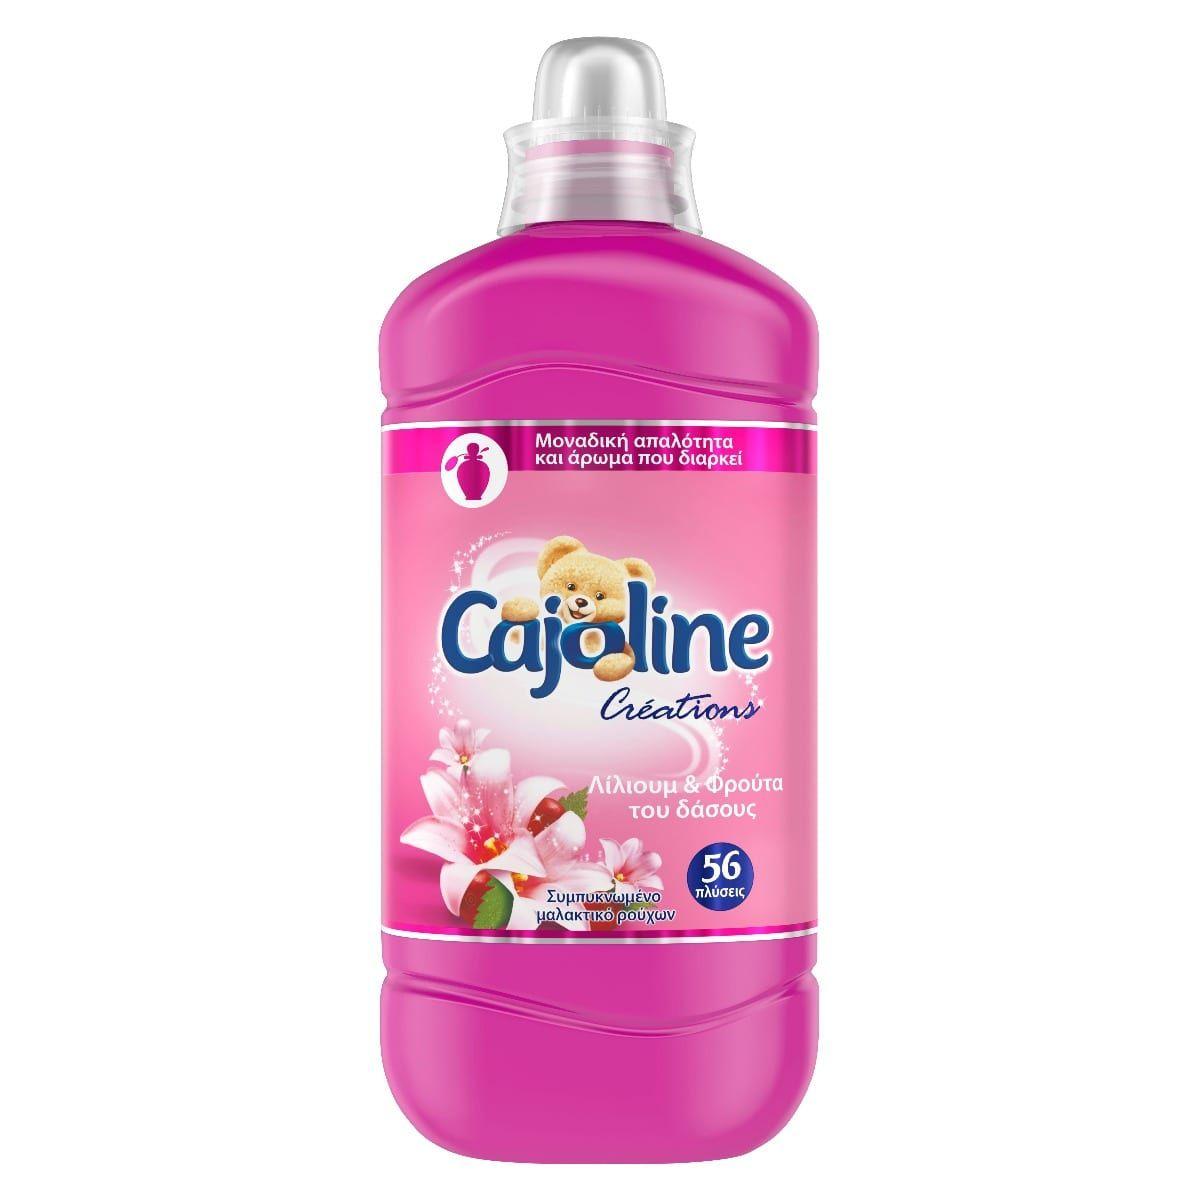 Cajoline Συμπυκνωμένο Μαλακτικό Λίλιουμ και Φρούτα του Δάσους 1,4lt